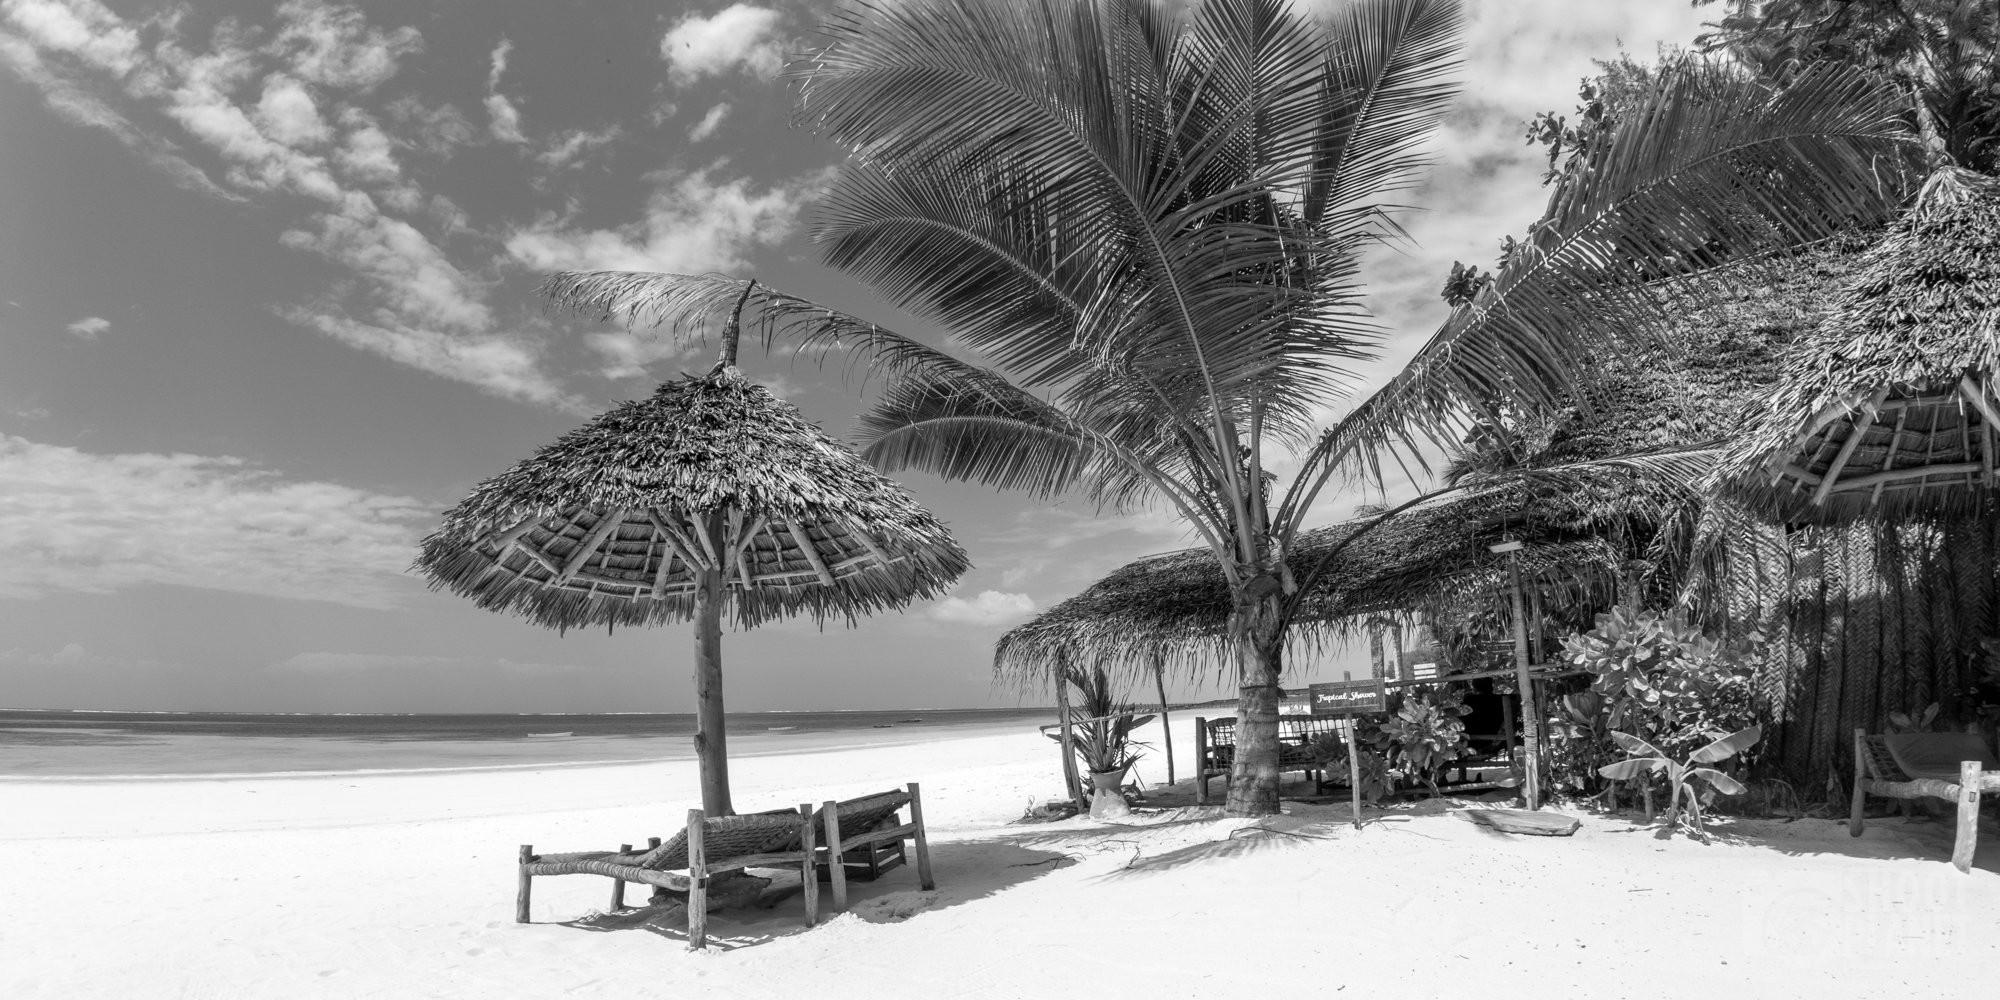 Kiwengwa beach b&w panorama, Zanzibar Tanzania